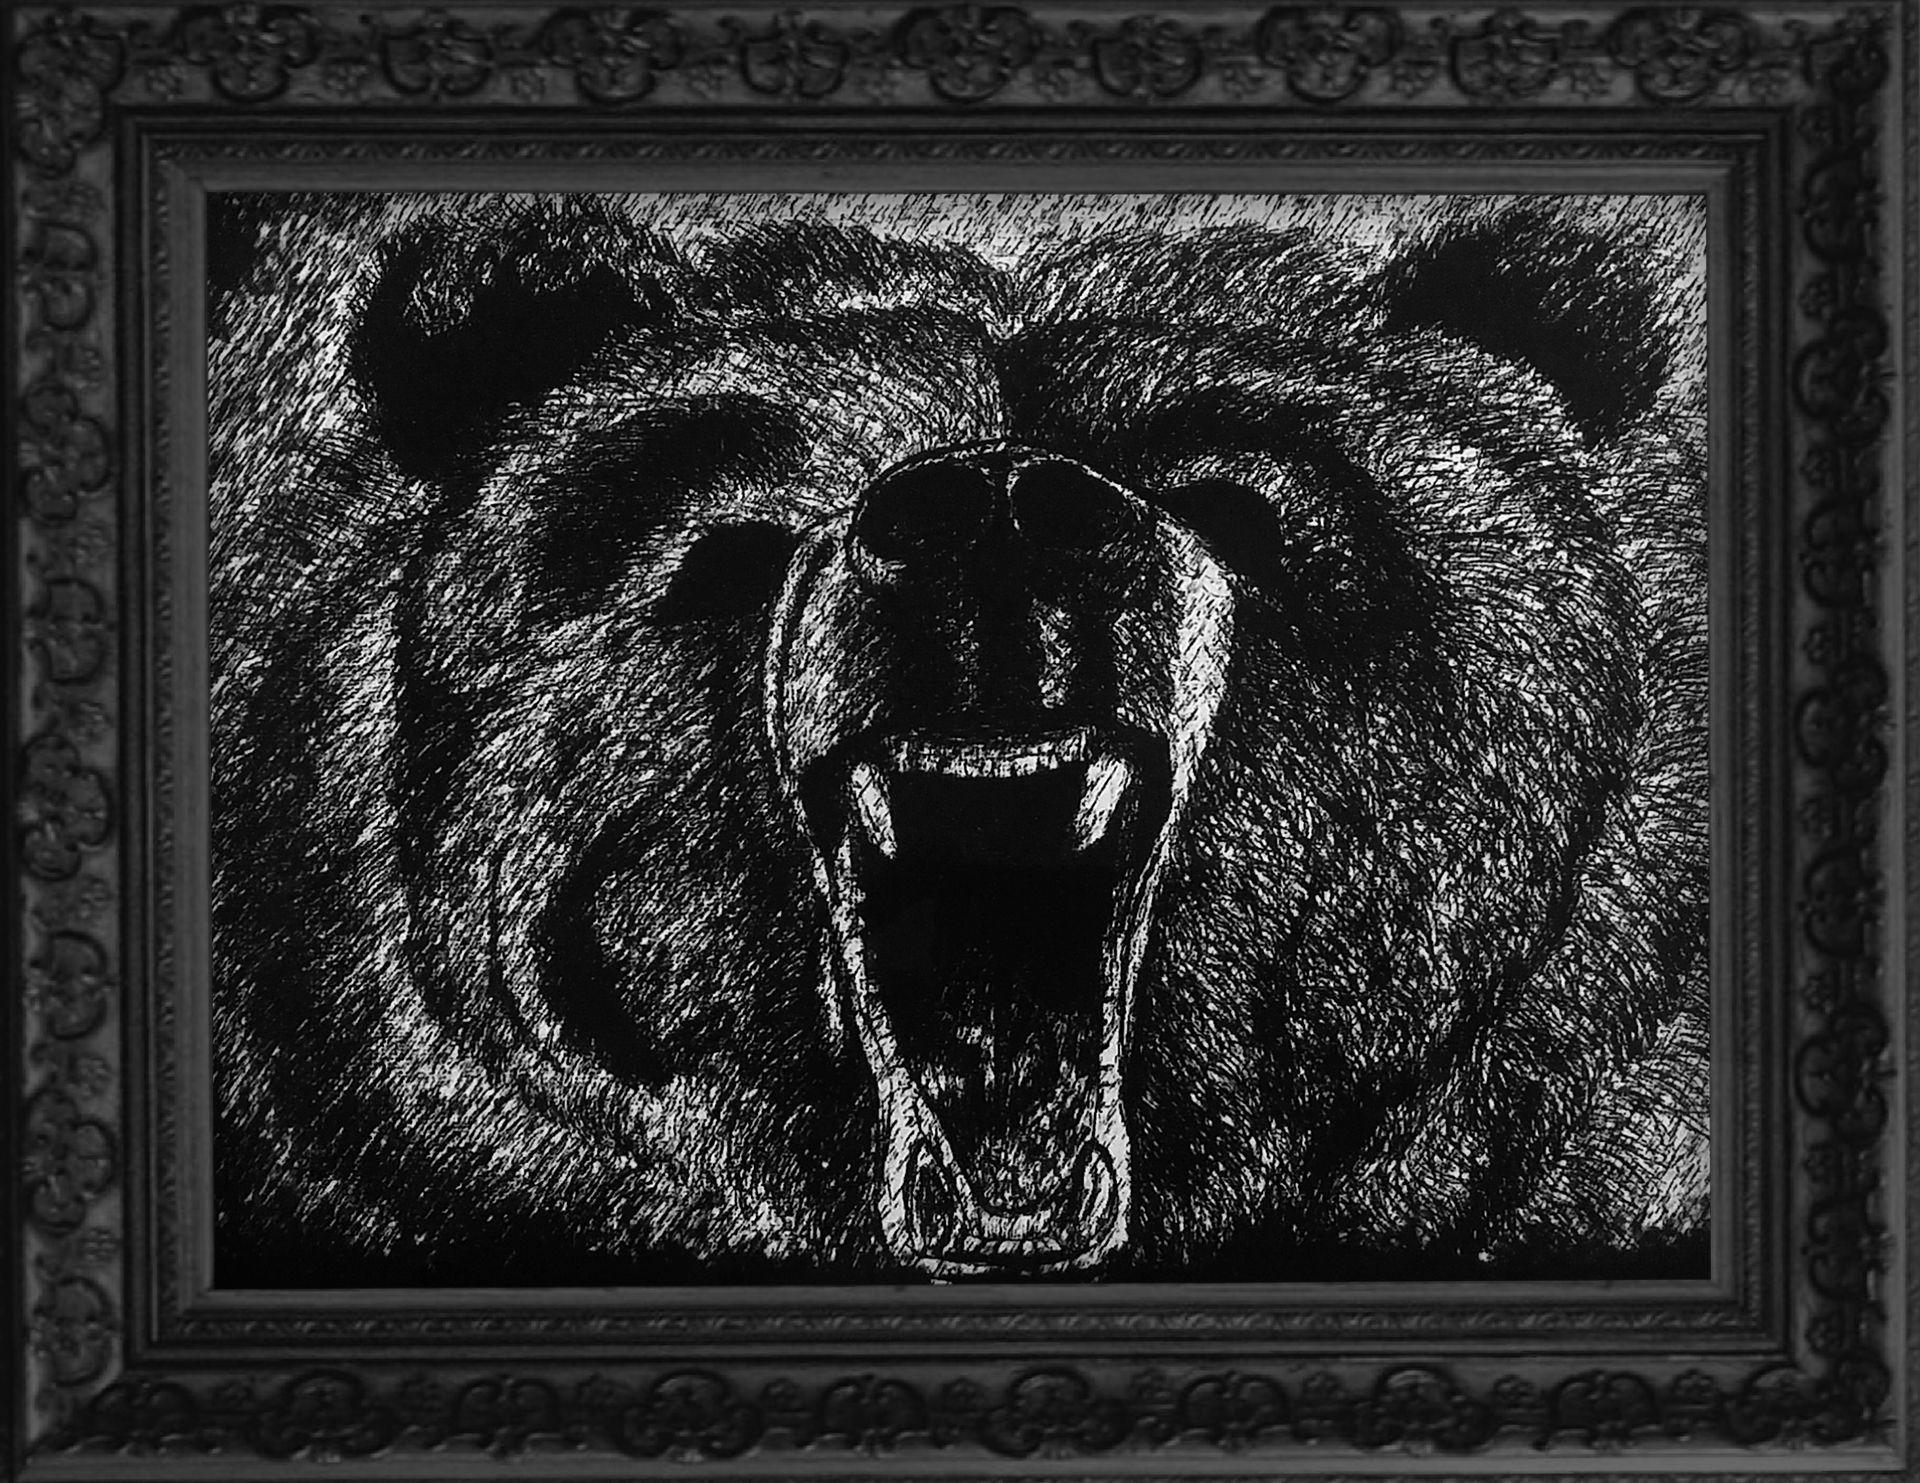 gift halloween present decor christmas home animal man bear wild wildlife cave hunting hunt hunter roar roaring angry